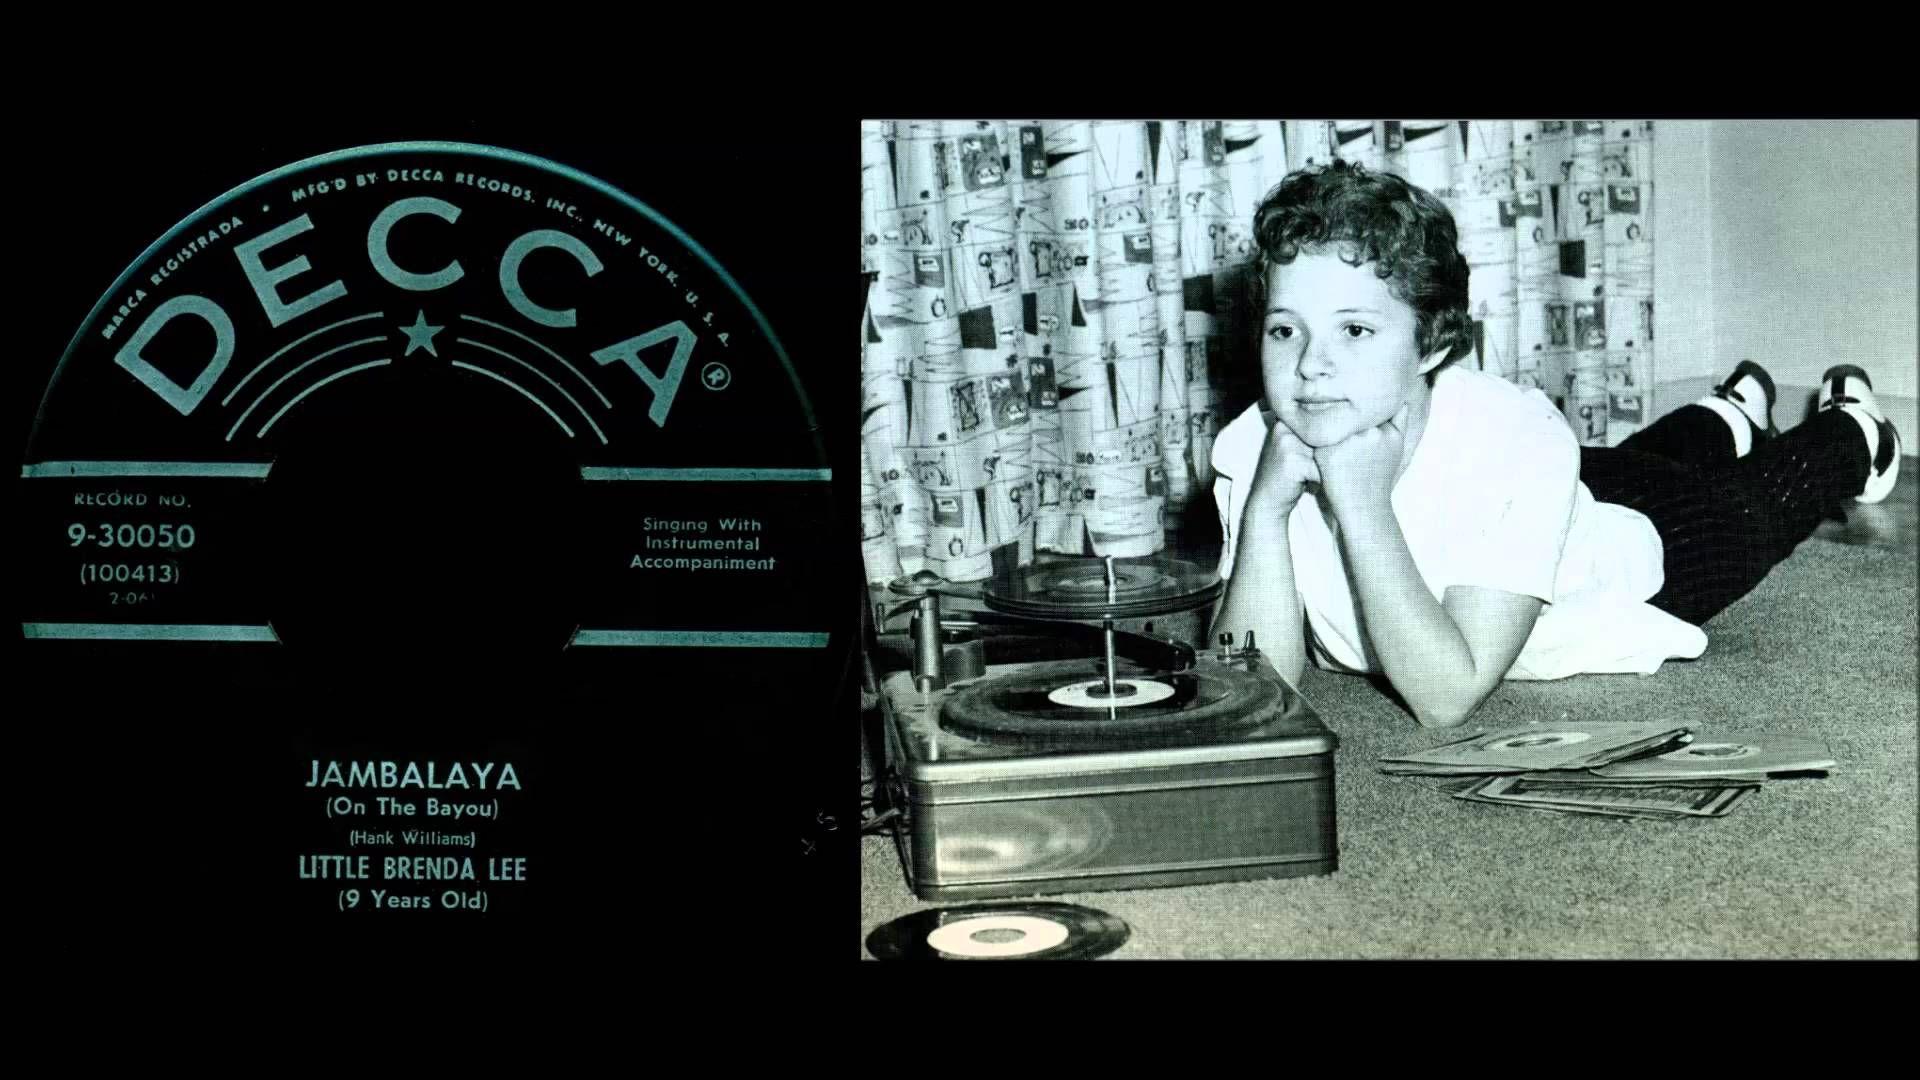 Brenda Lee - Jambalaya (On The Bayou) (Brenda Lee's first ...